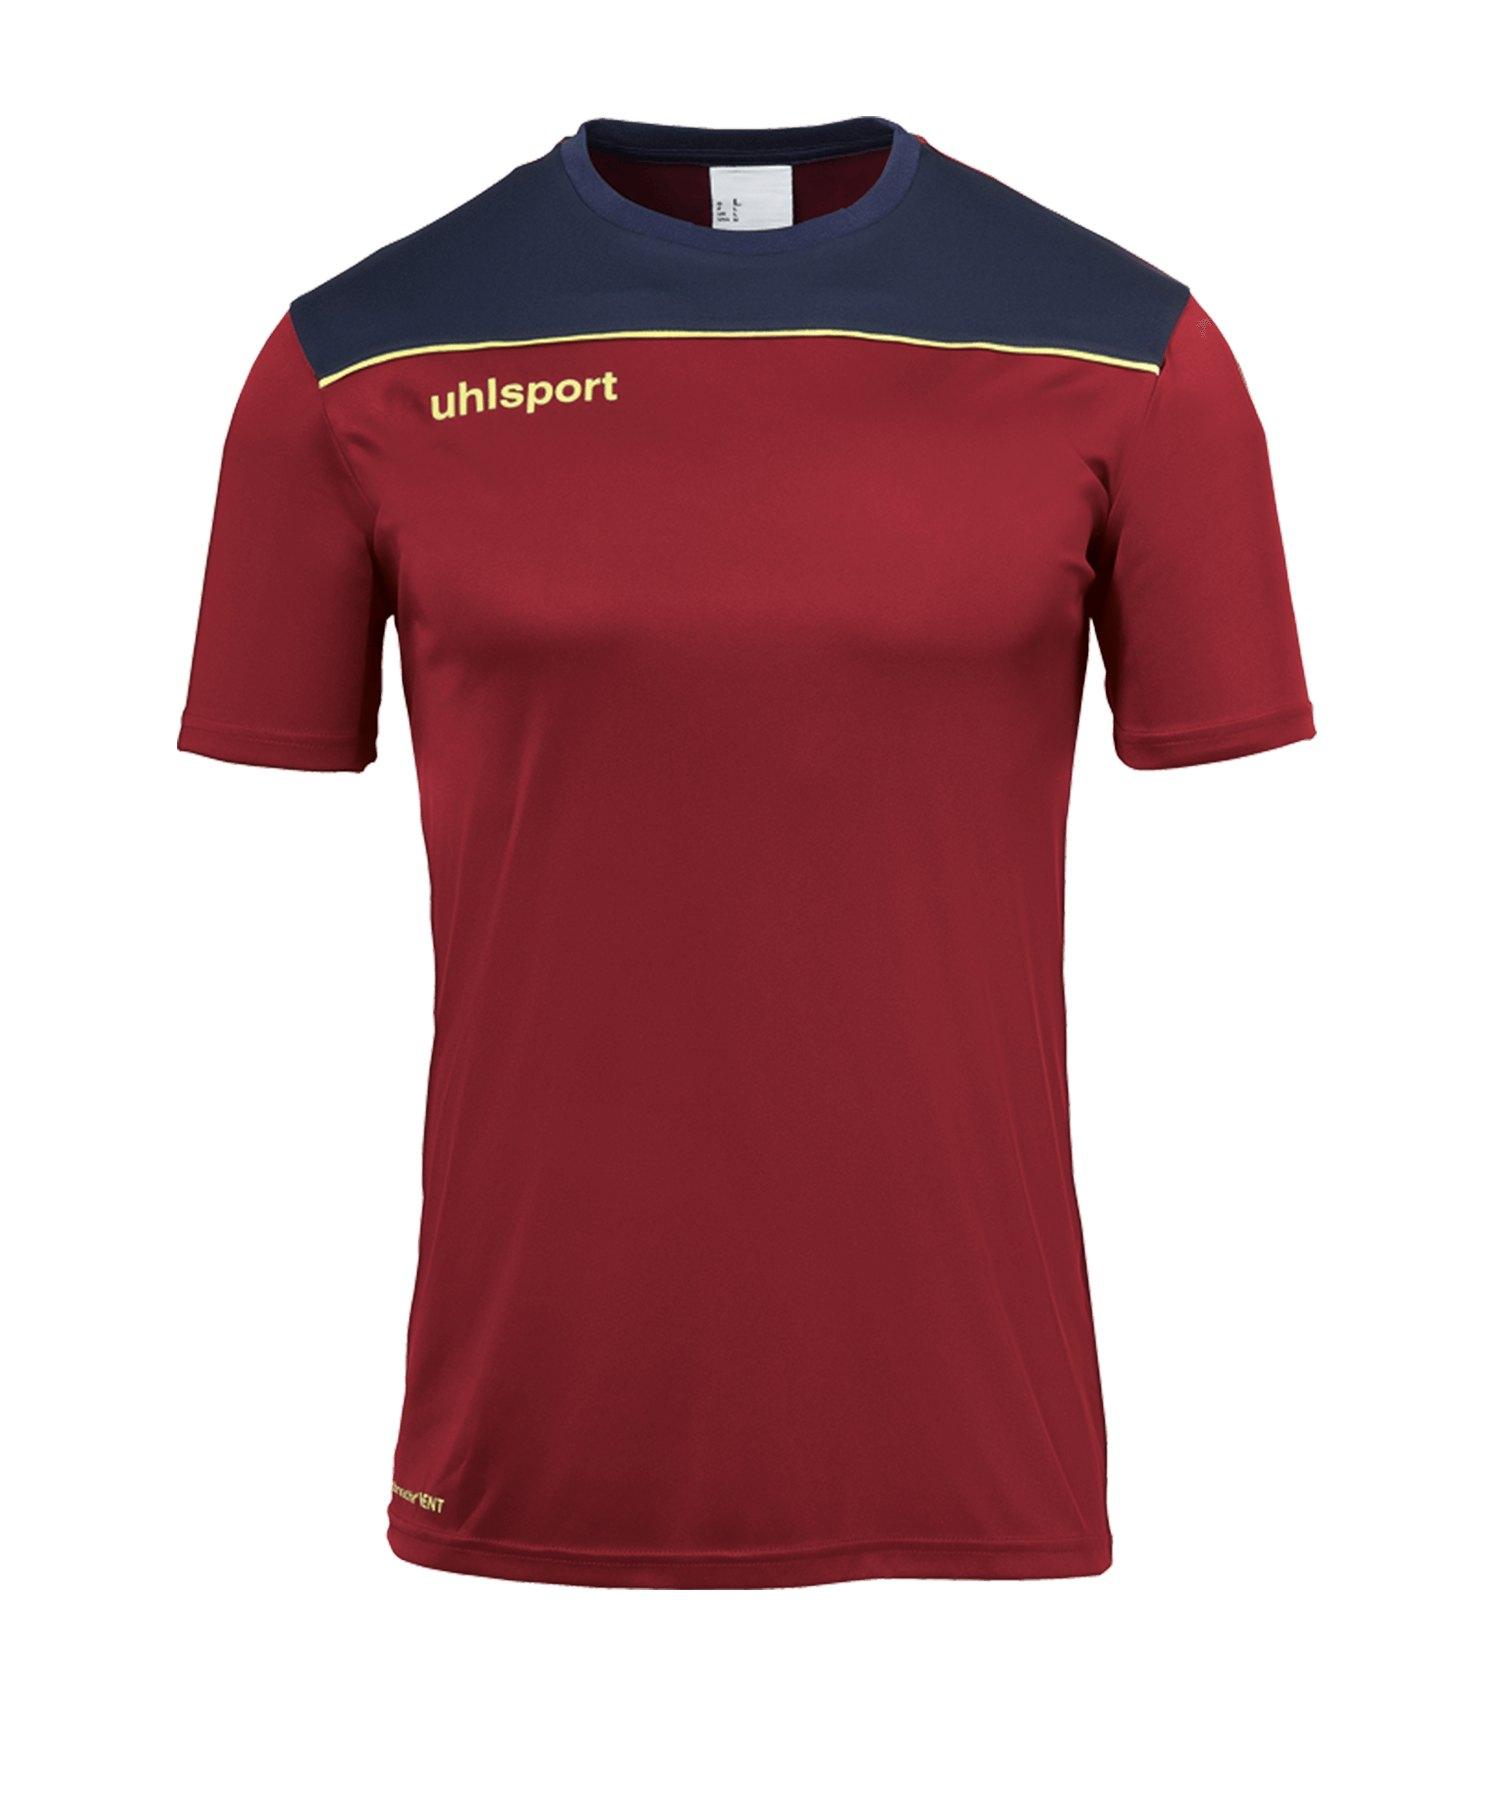 Uhlsport Offense 23 Poly T-Shirt Blau F13 - rot